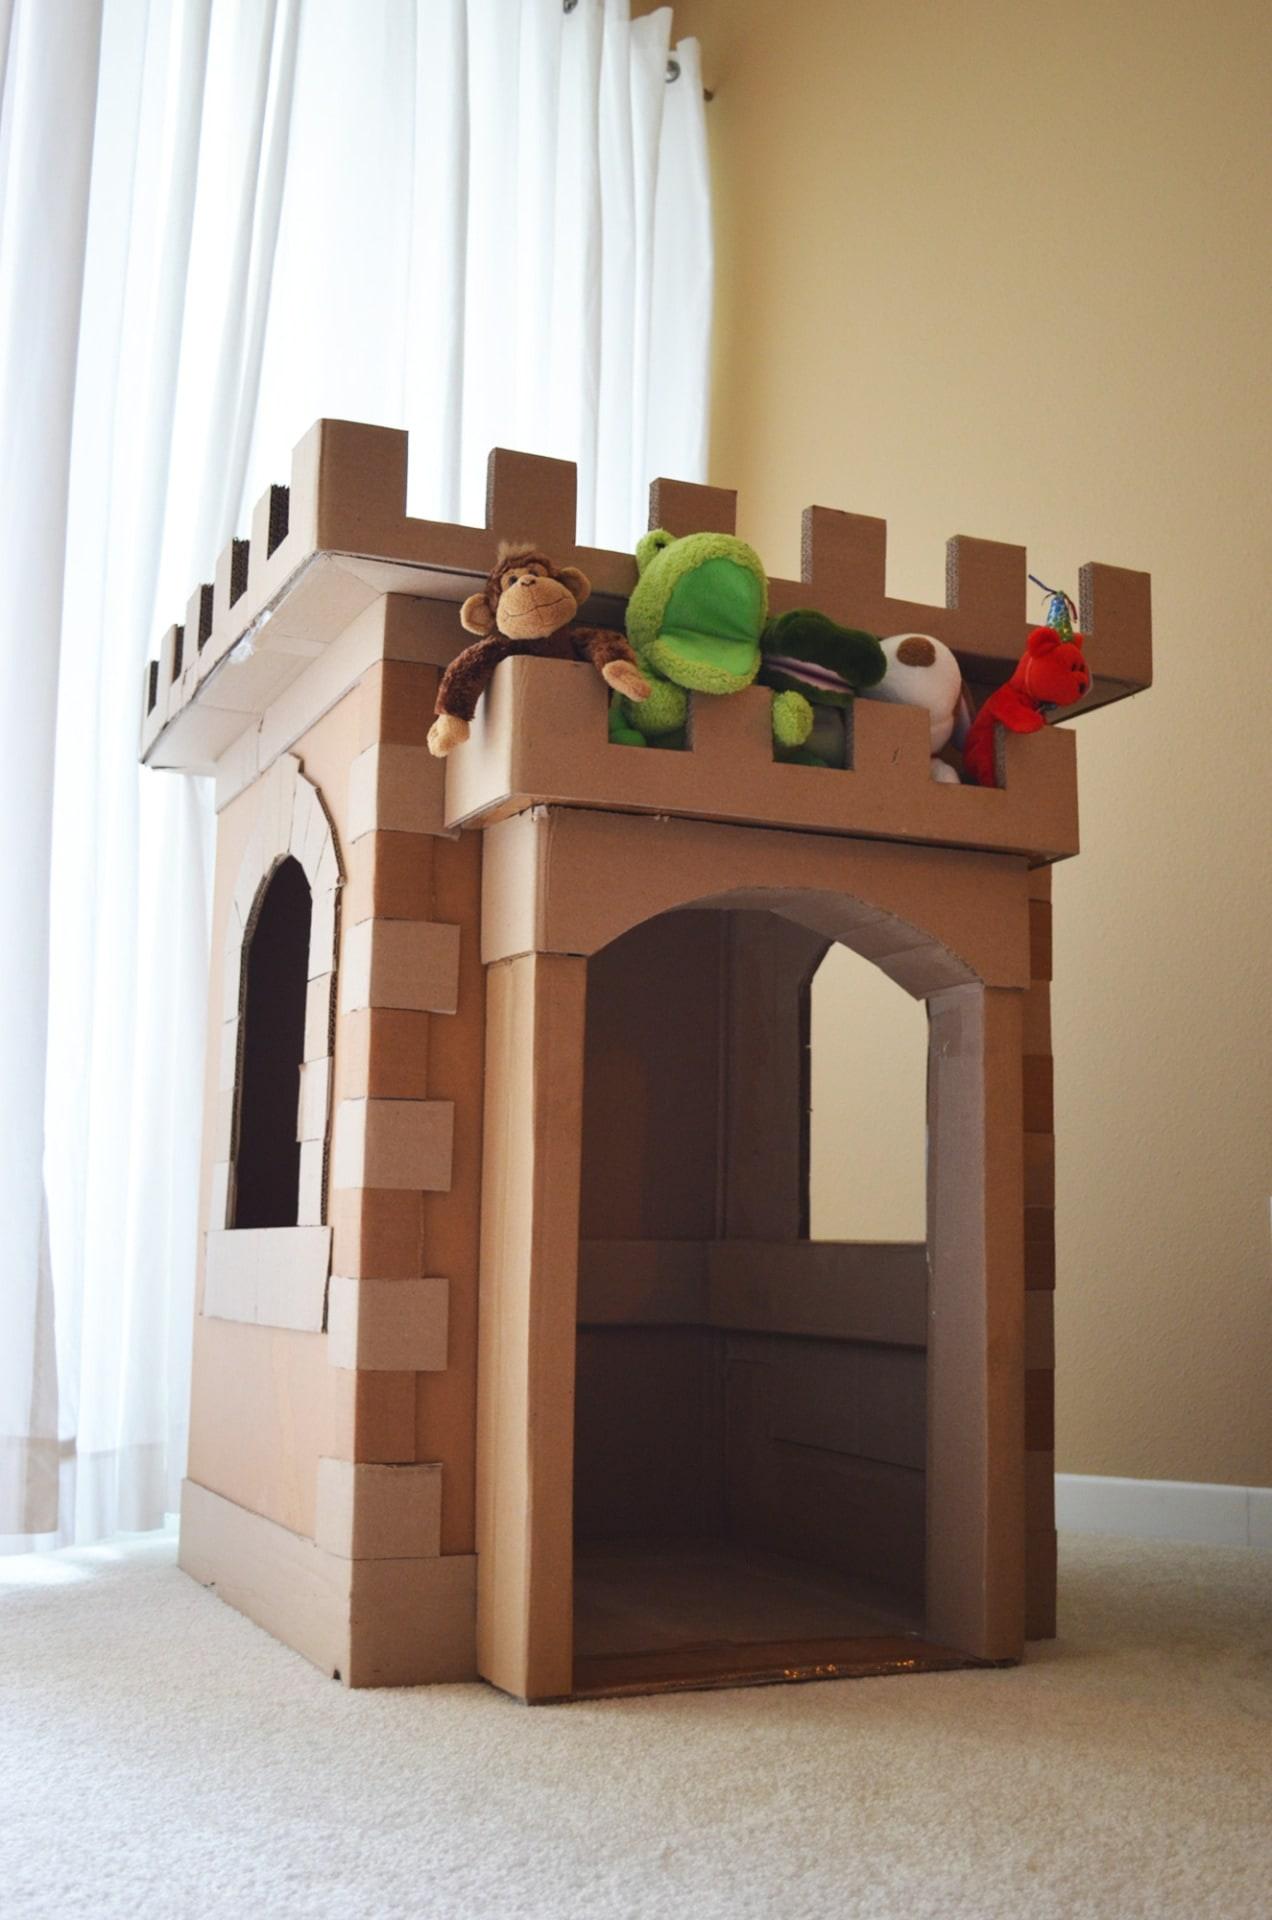 Cardboard Castle Construction Fun Brandon Tran